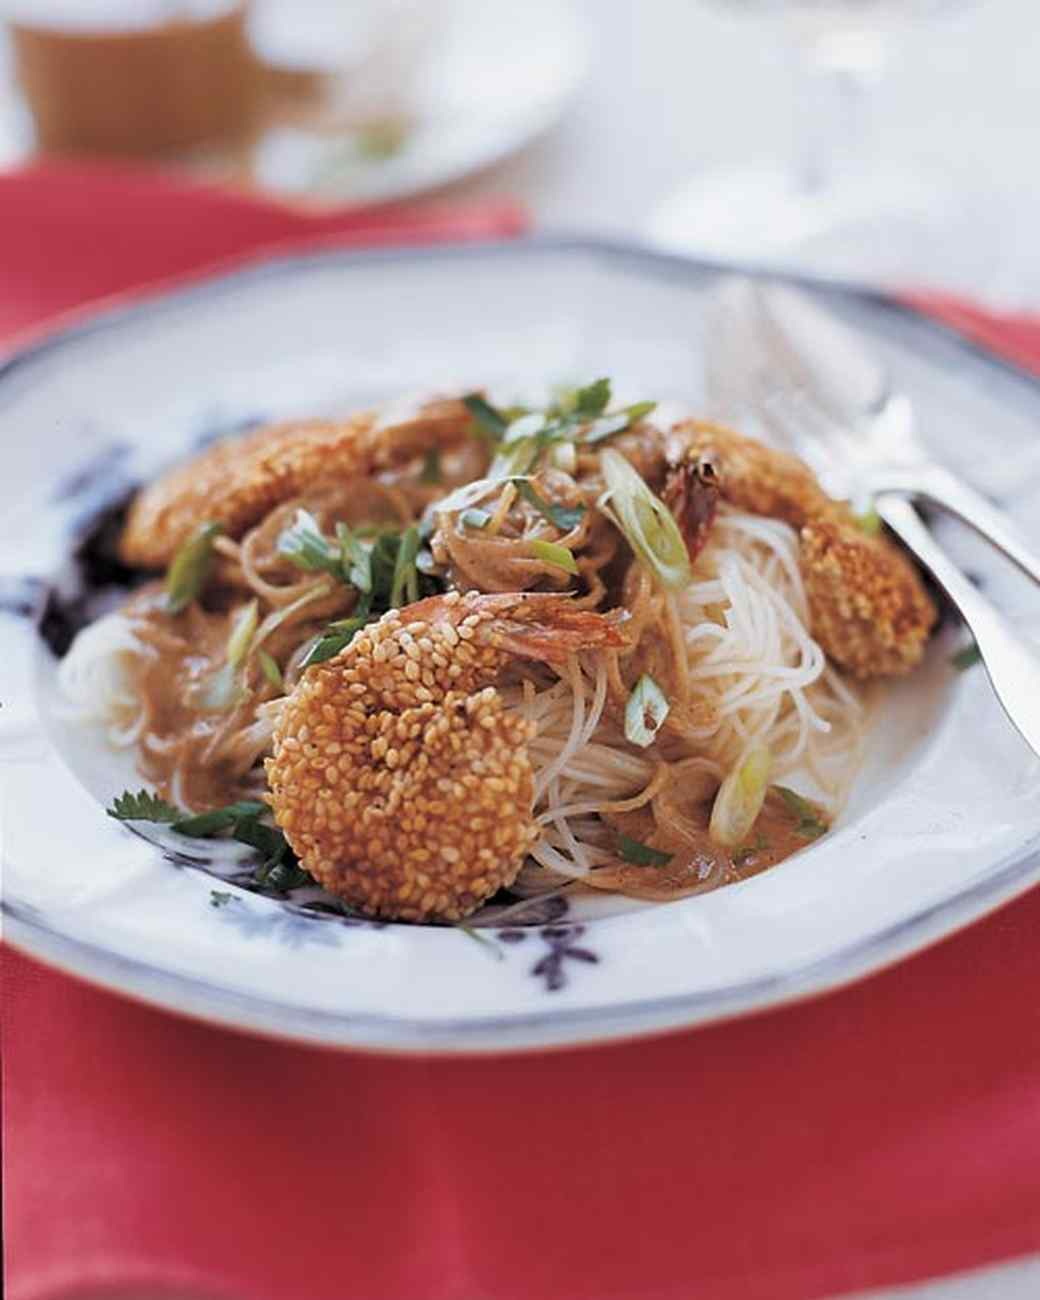 Sesame Seed Crusted Shrimp with Sesame Noodles